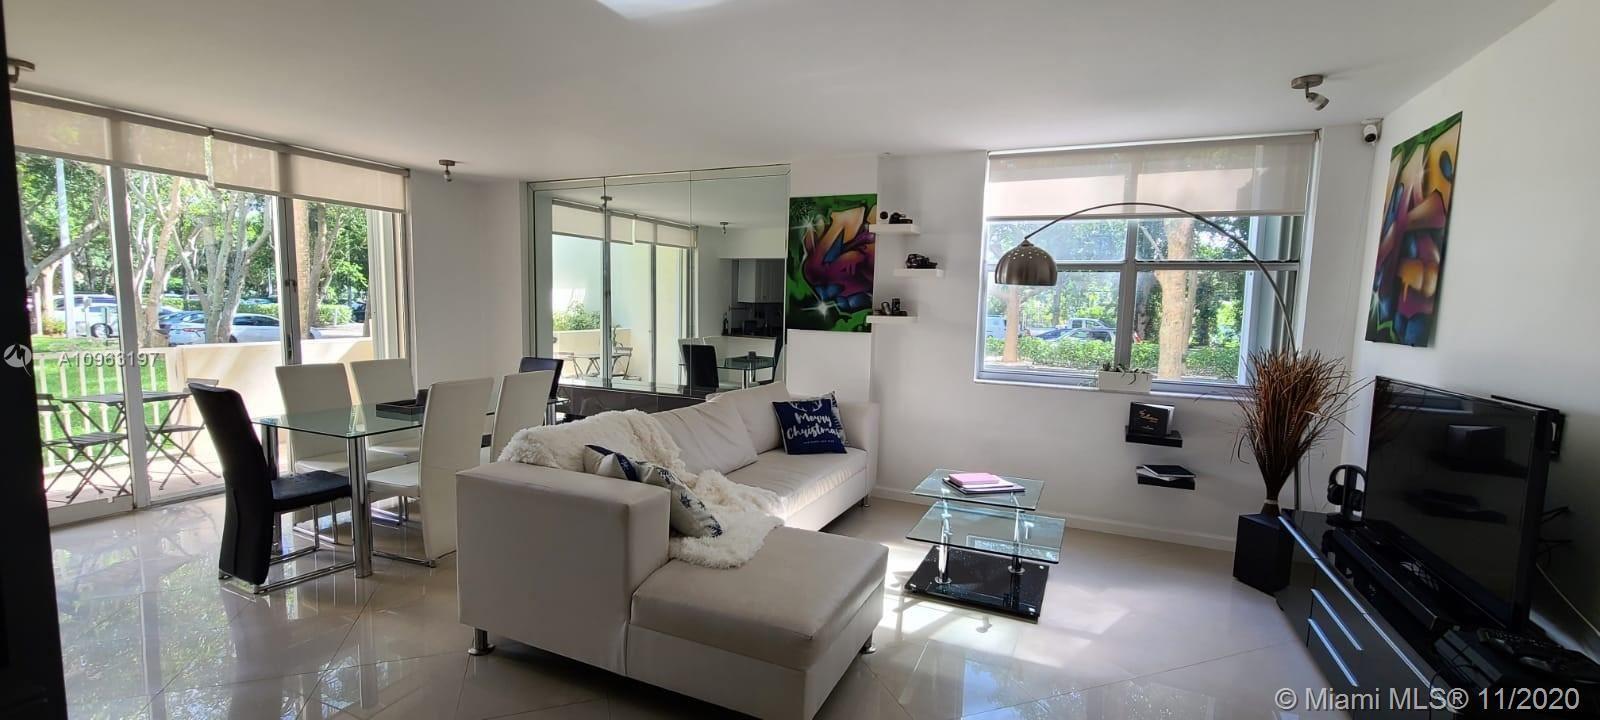 11111 Biscayne Blvd #1B, Miami, FL 33181 - #: A10963197